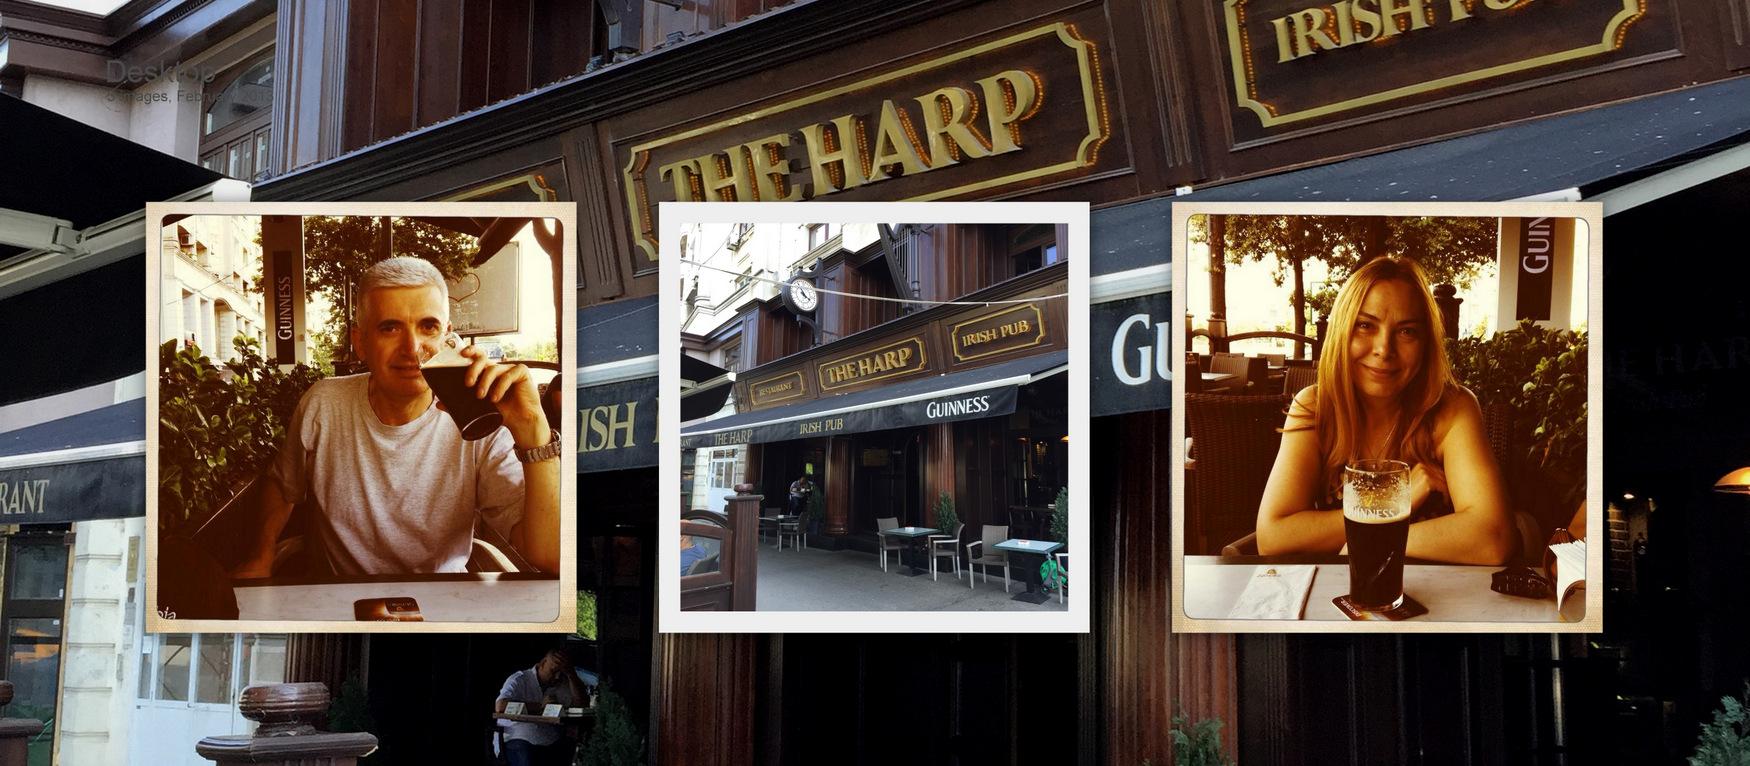 Historic Houses of romania - Case de Epoca drinks event, la pub-ul The Harp, joi 6 august, de la 18.30h